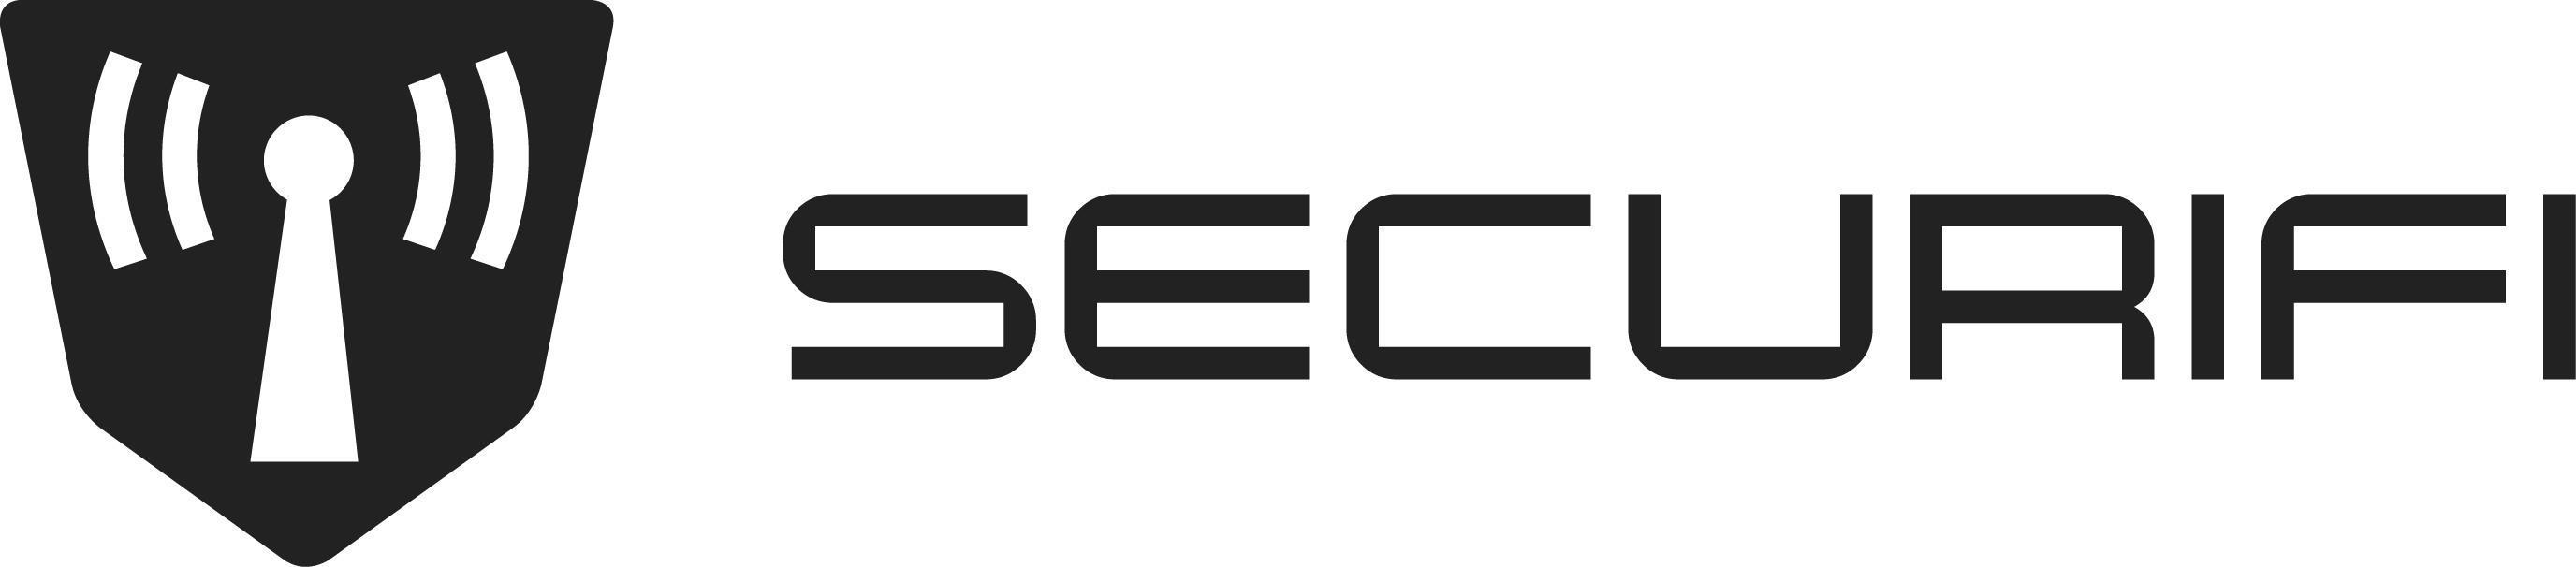 eero Competitors, Revenue and Employees - Owler Company Profile